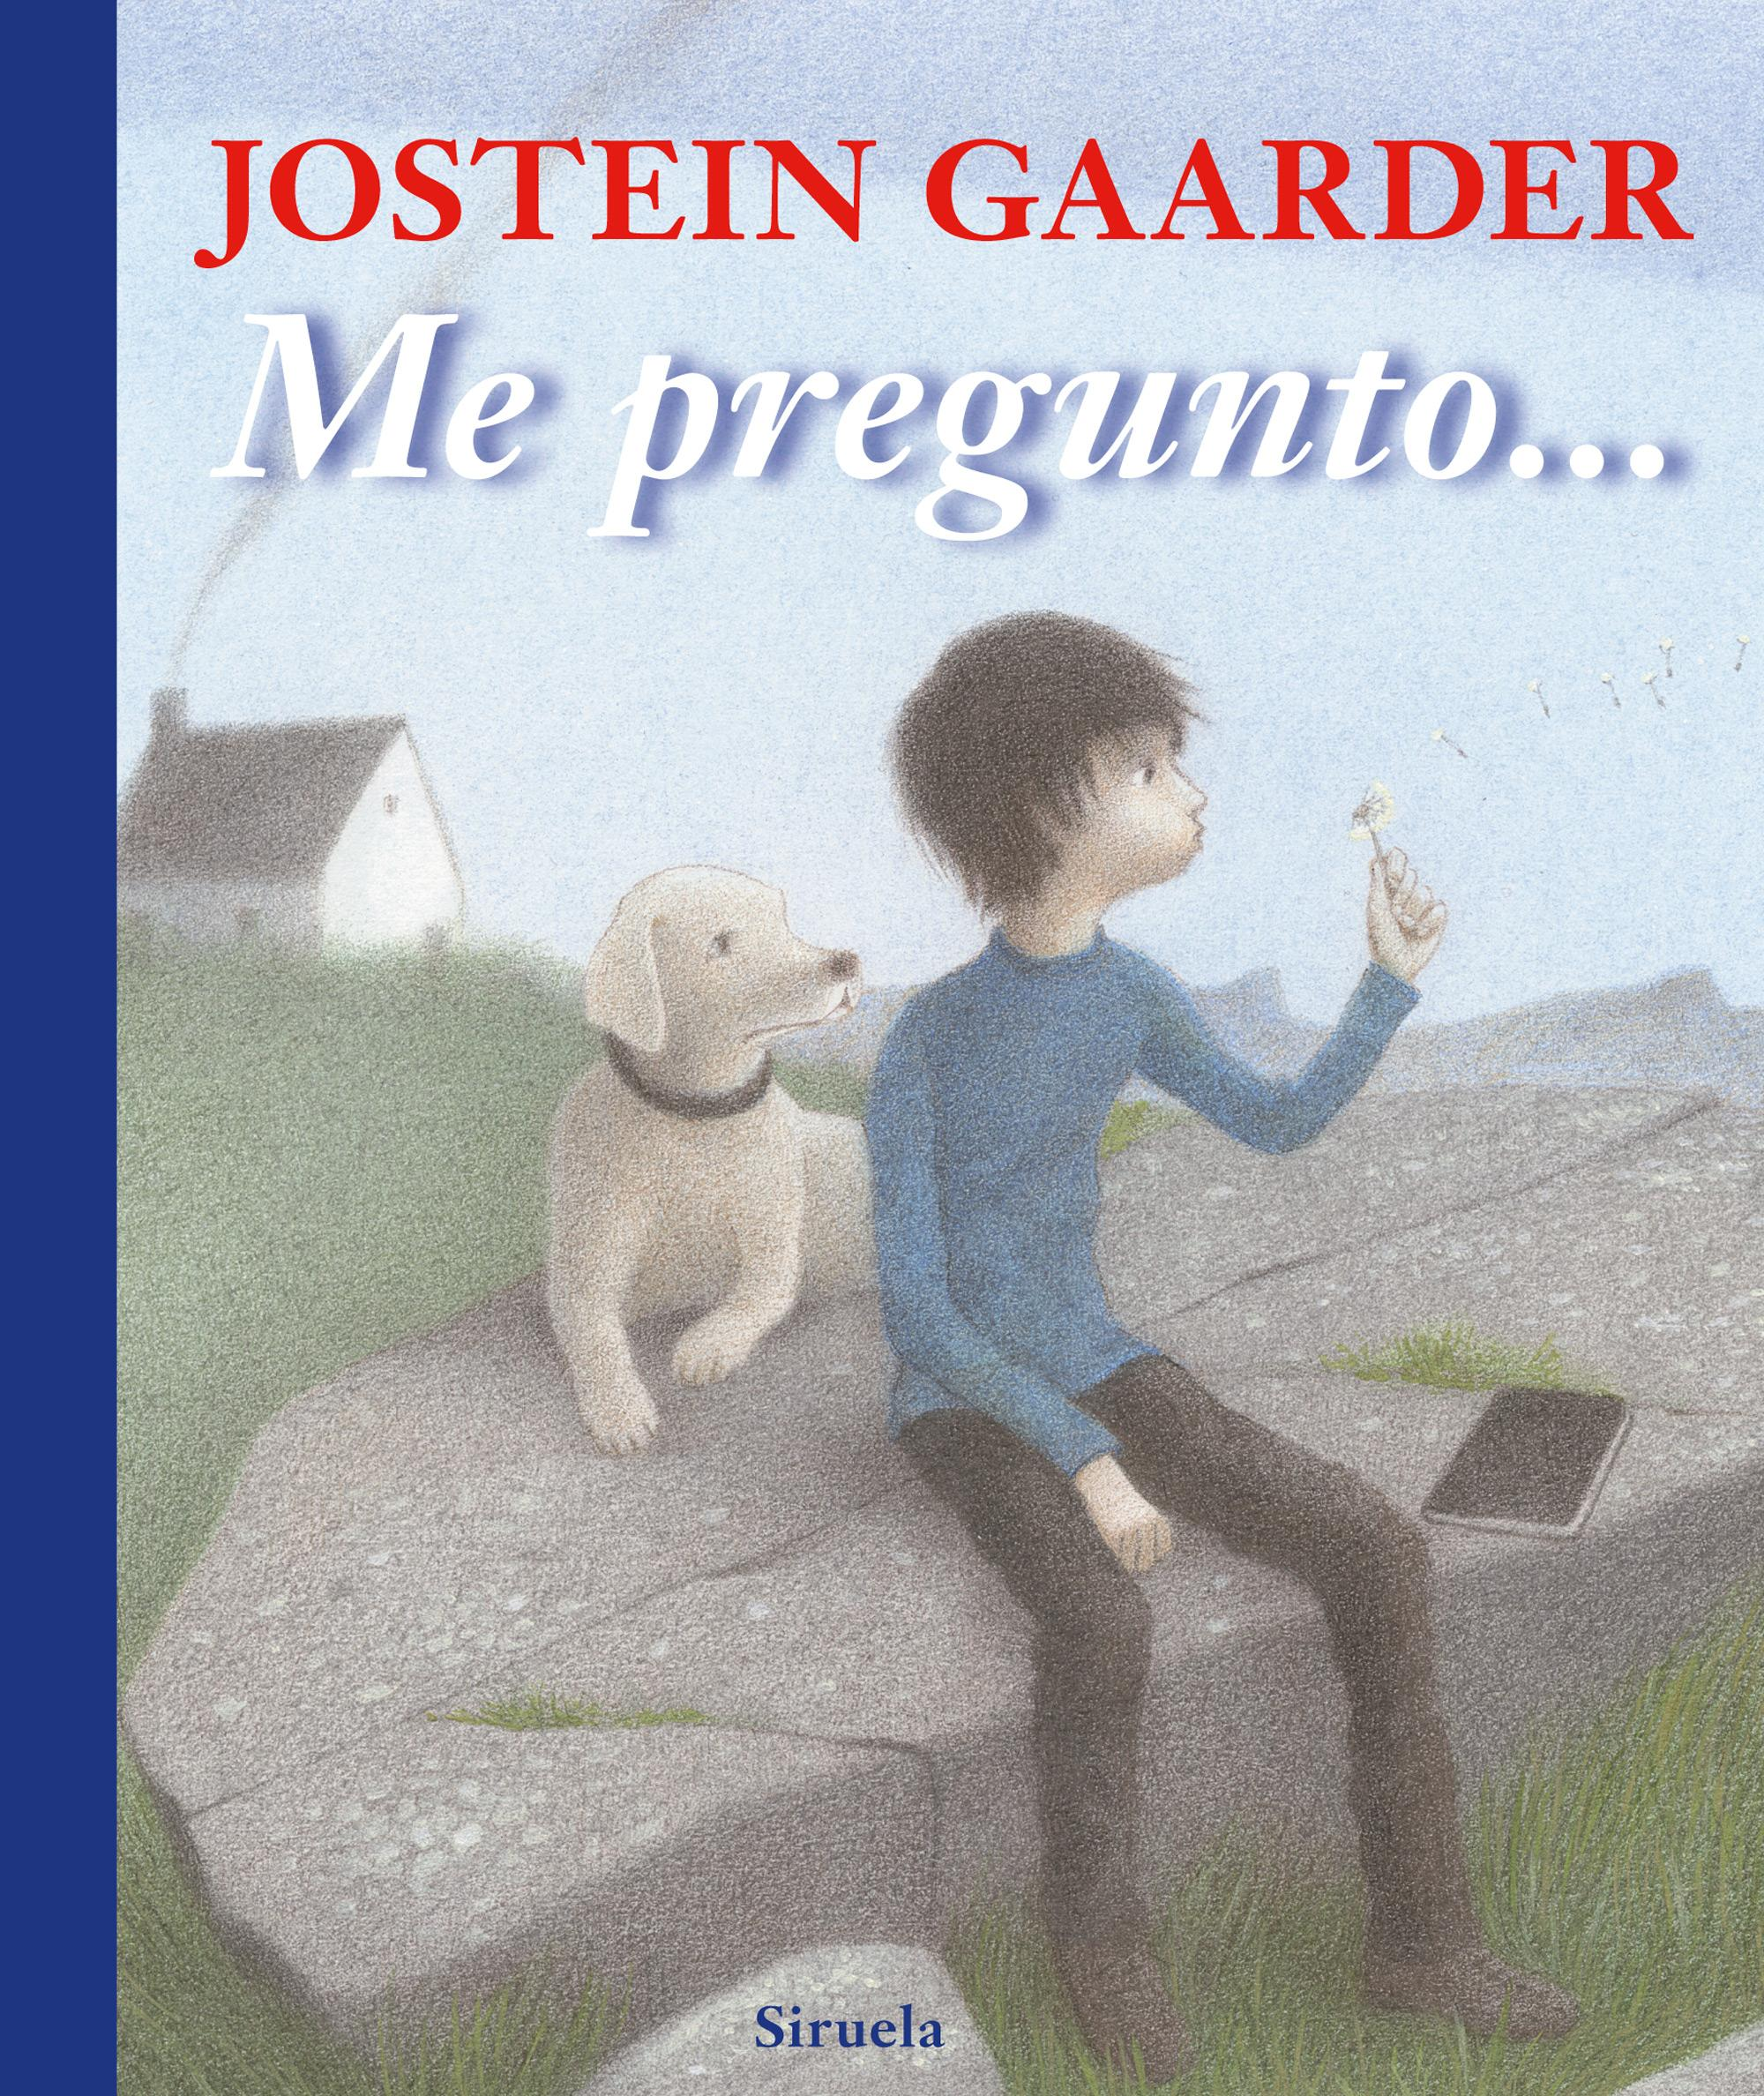 libro-jostein-gaarder-me-pregunto